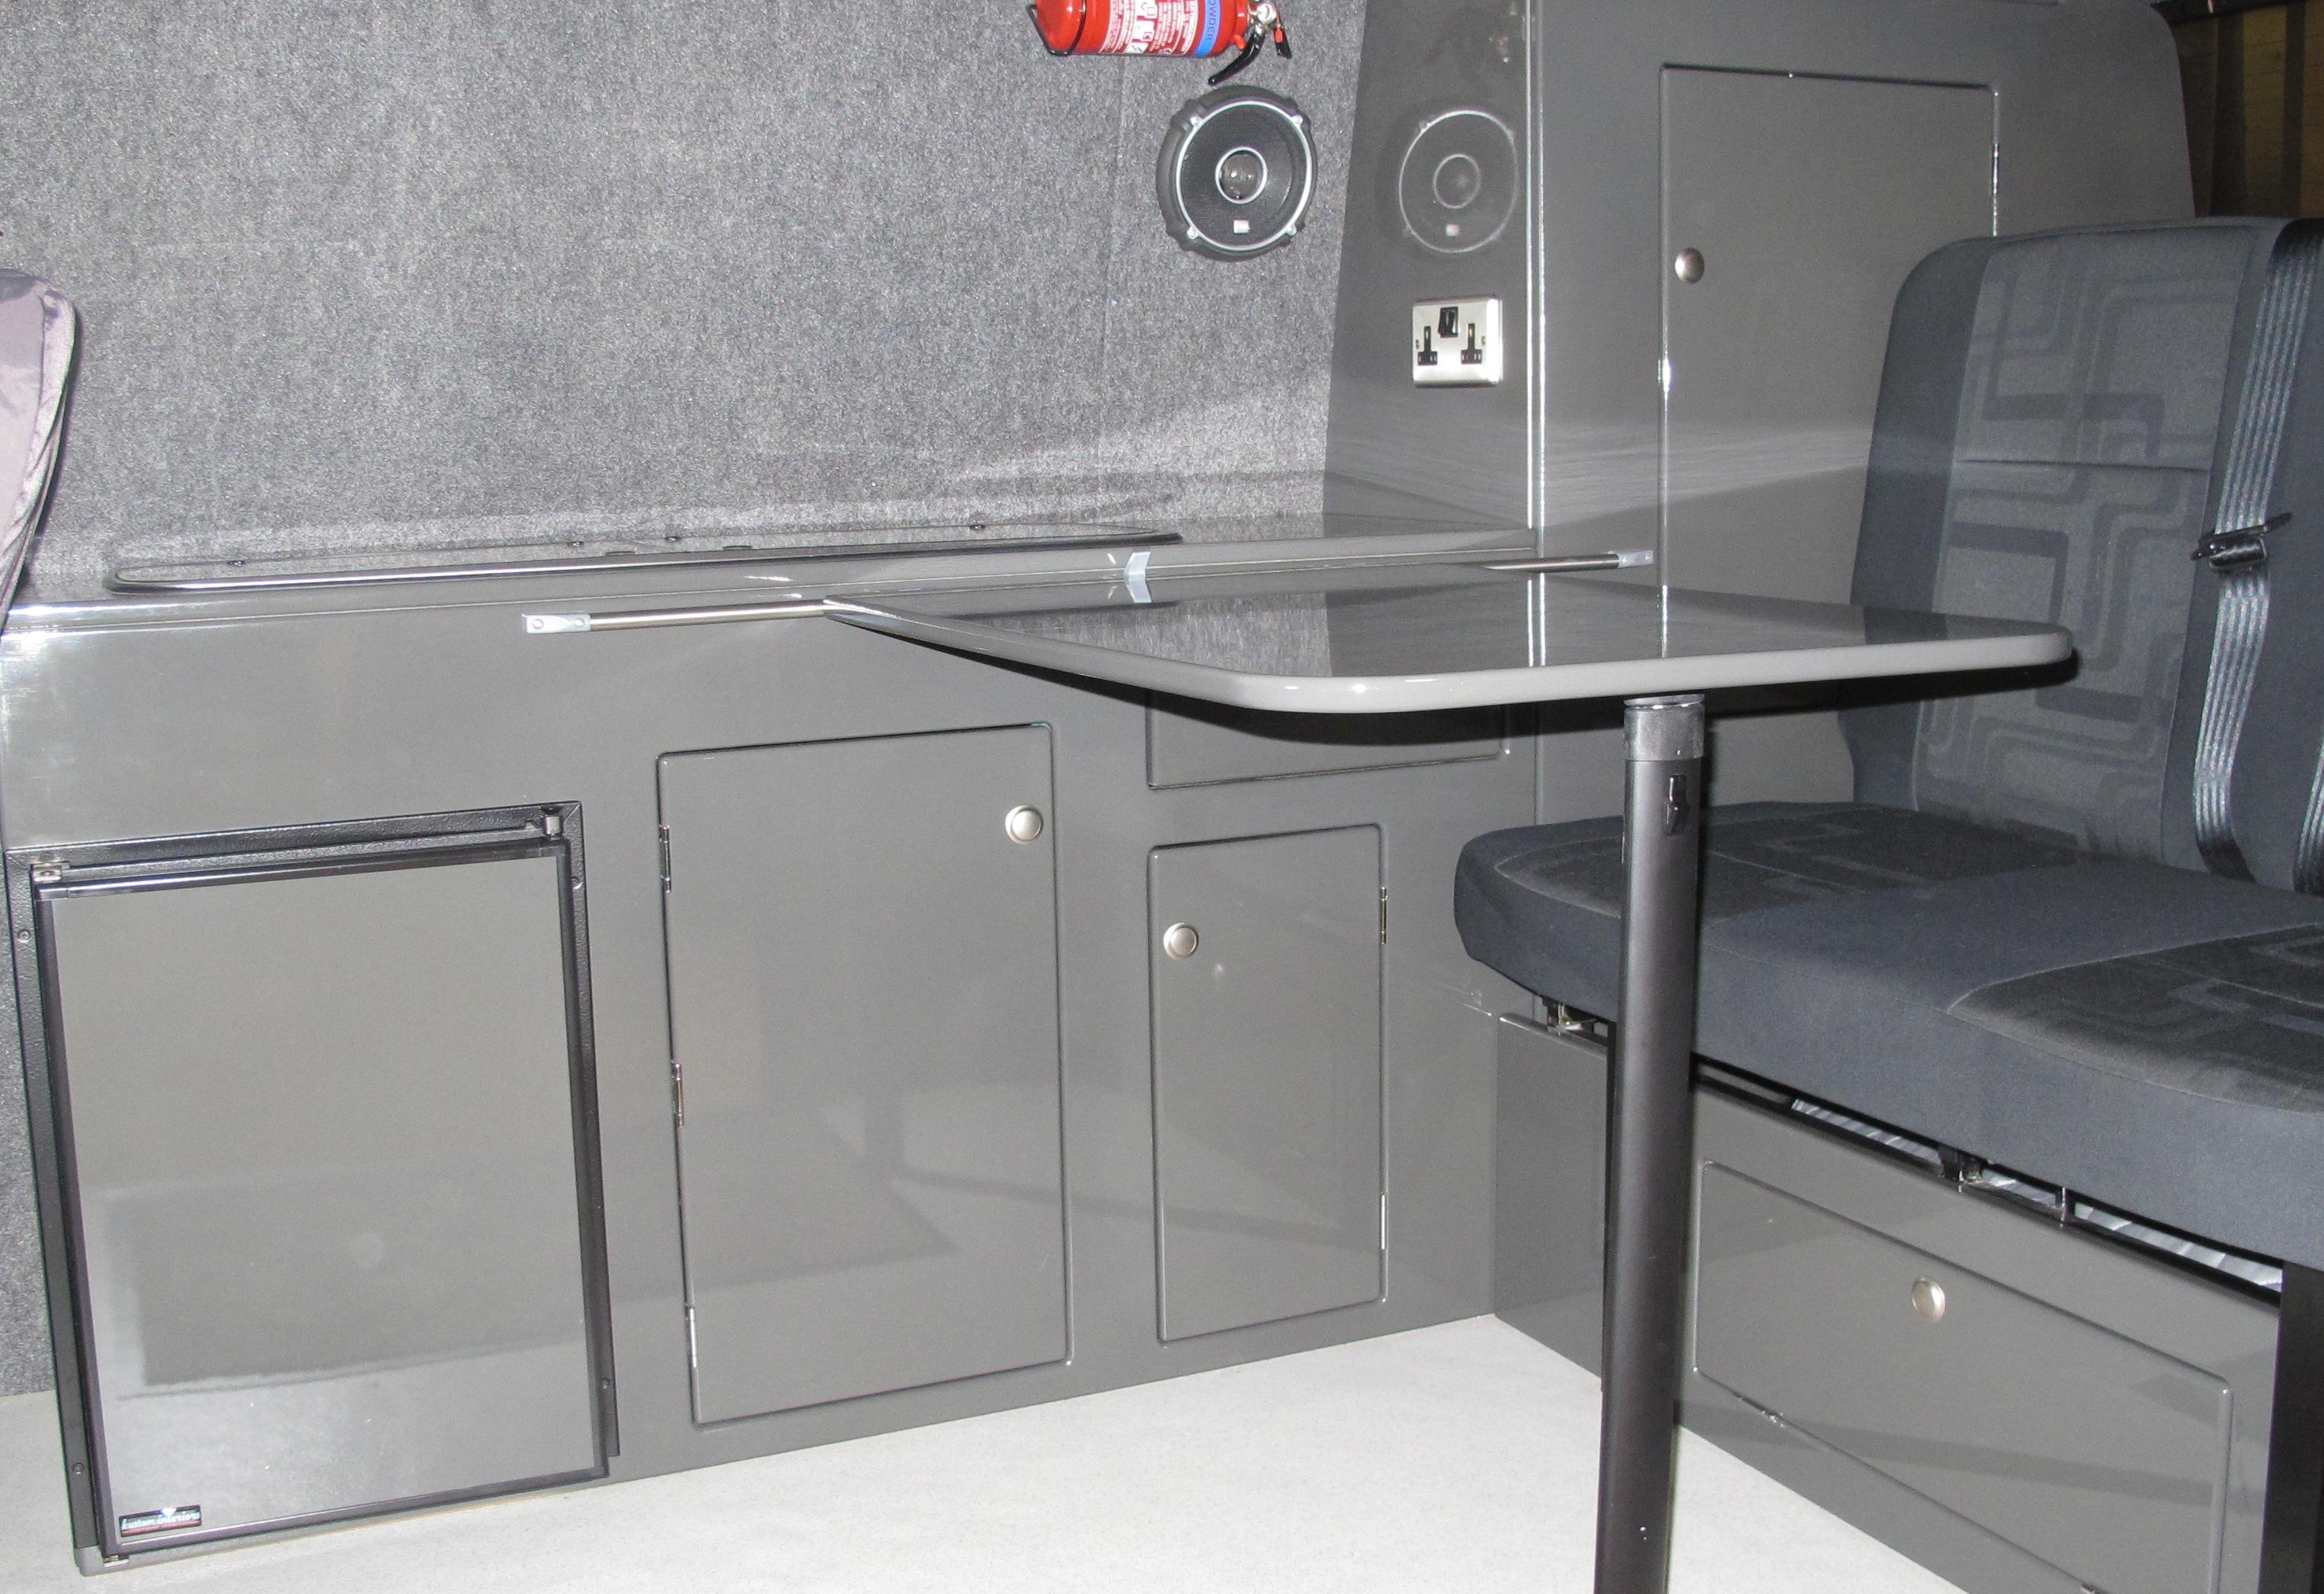 Kustominteriors t5 camper interior vw camper interiors for Vw t4 interior designs